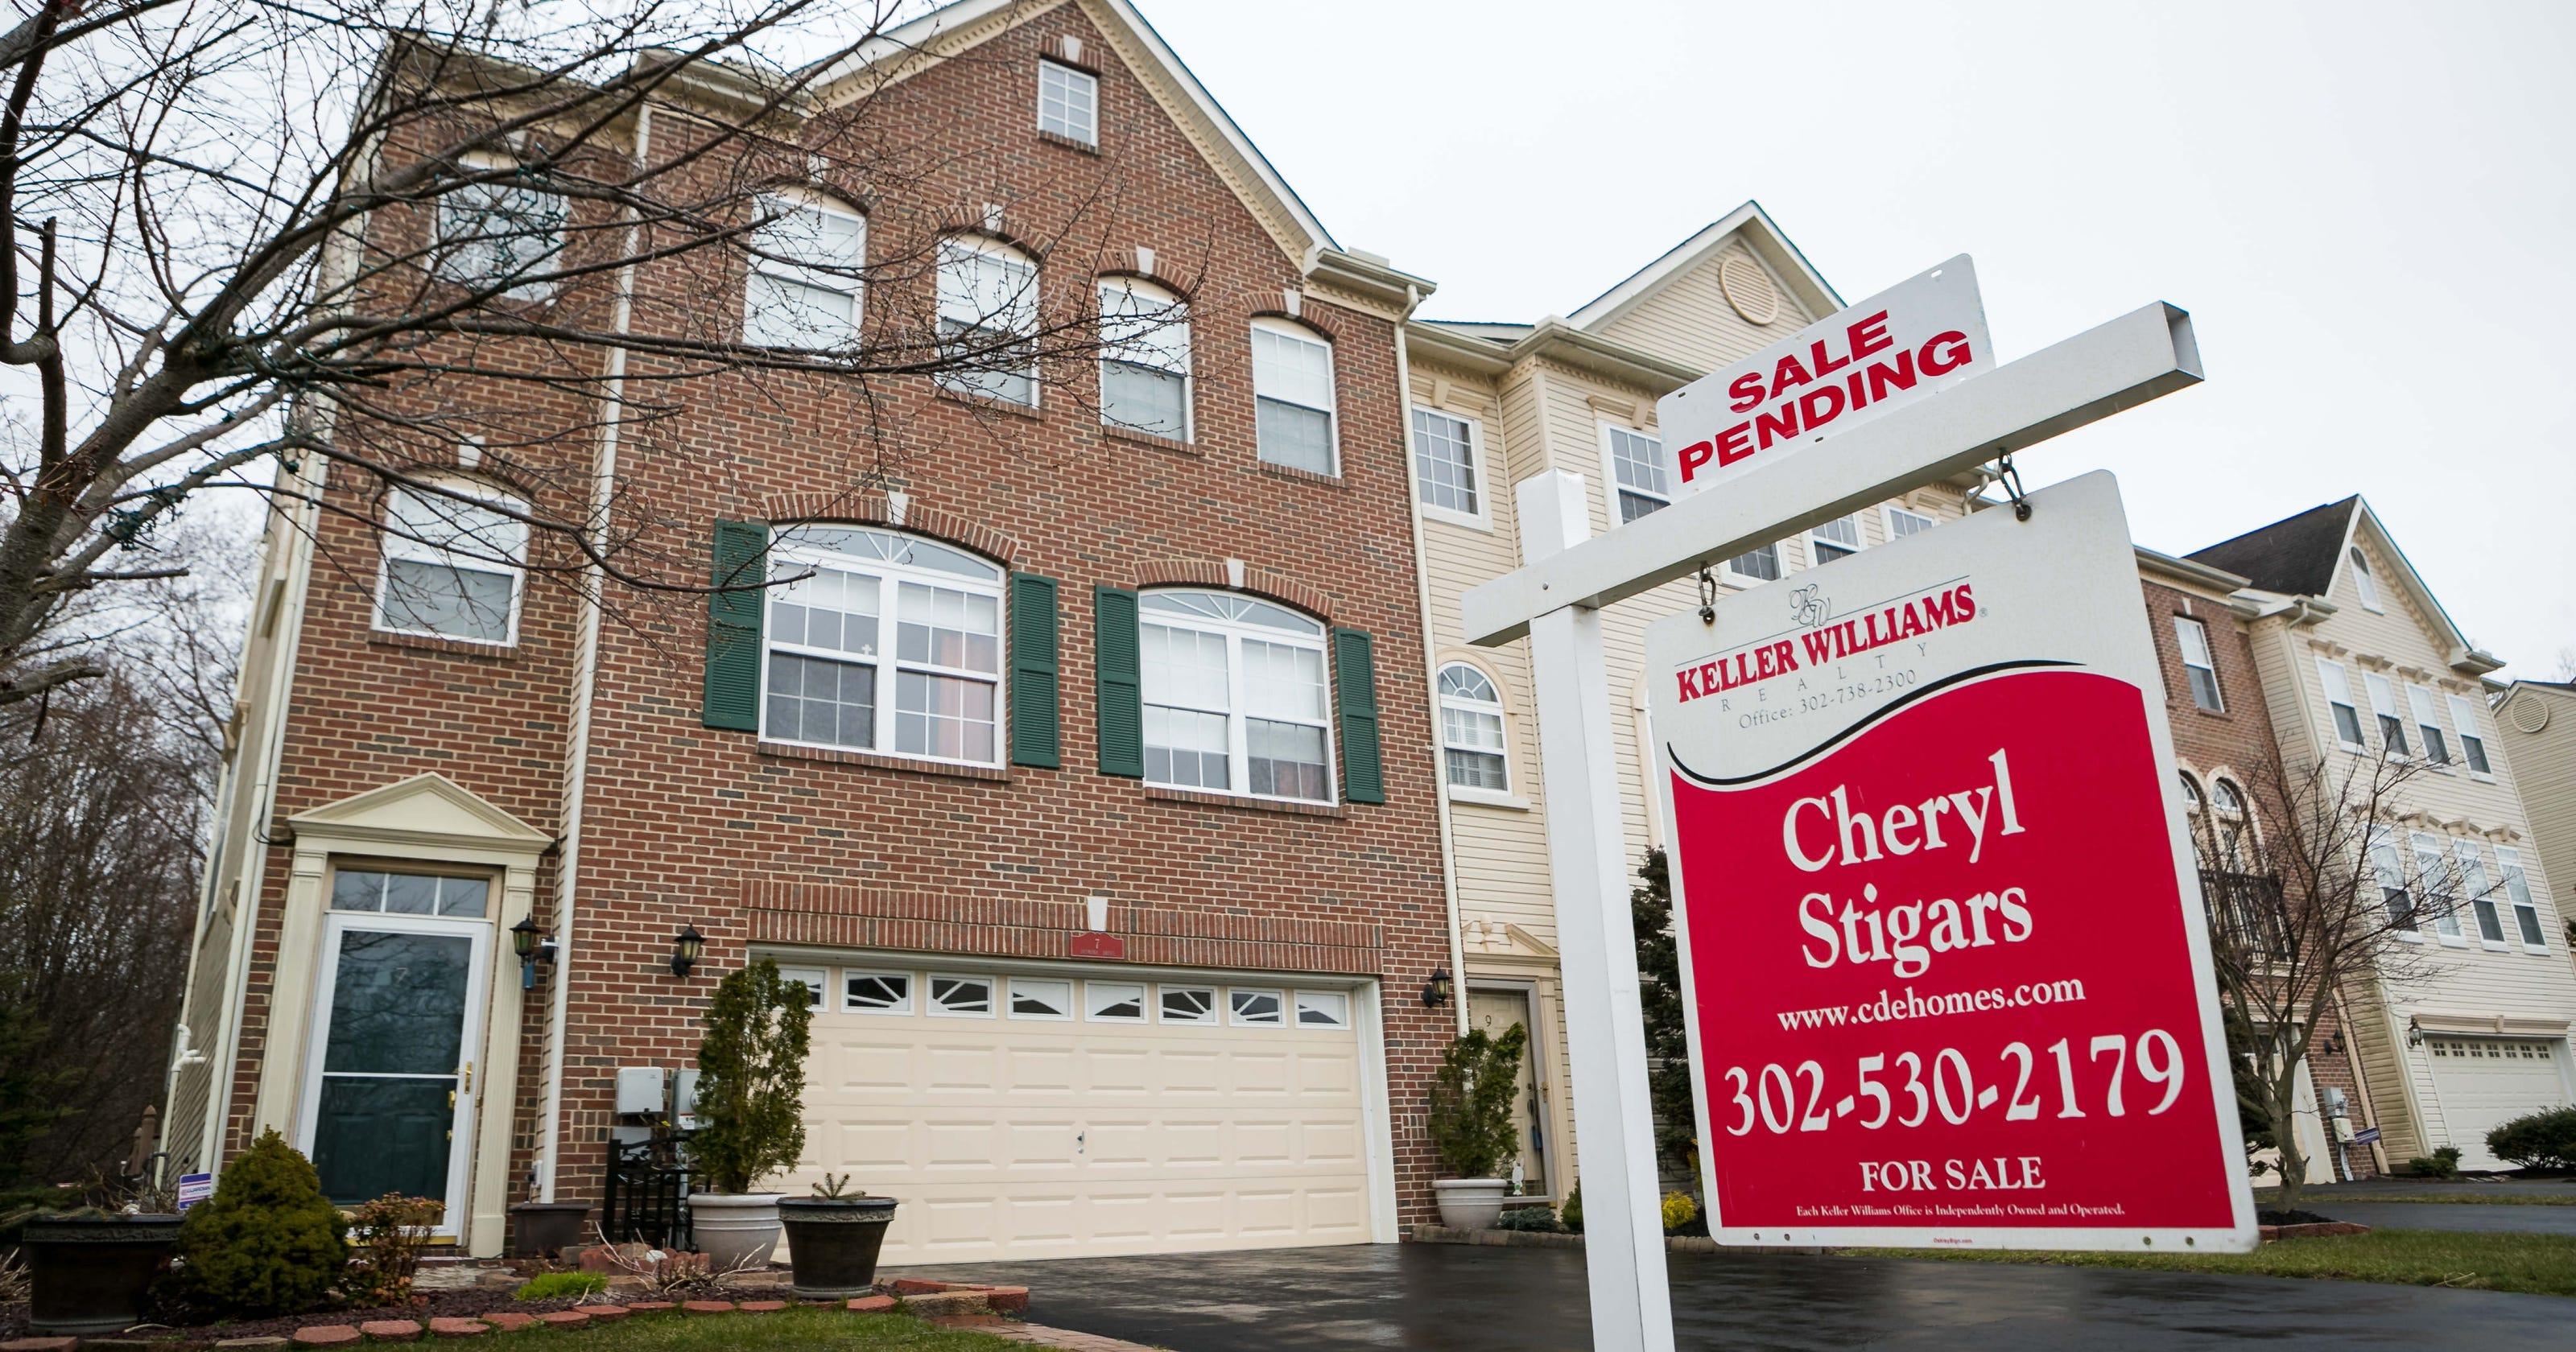 Hot sellers market takes over Delaware real estate